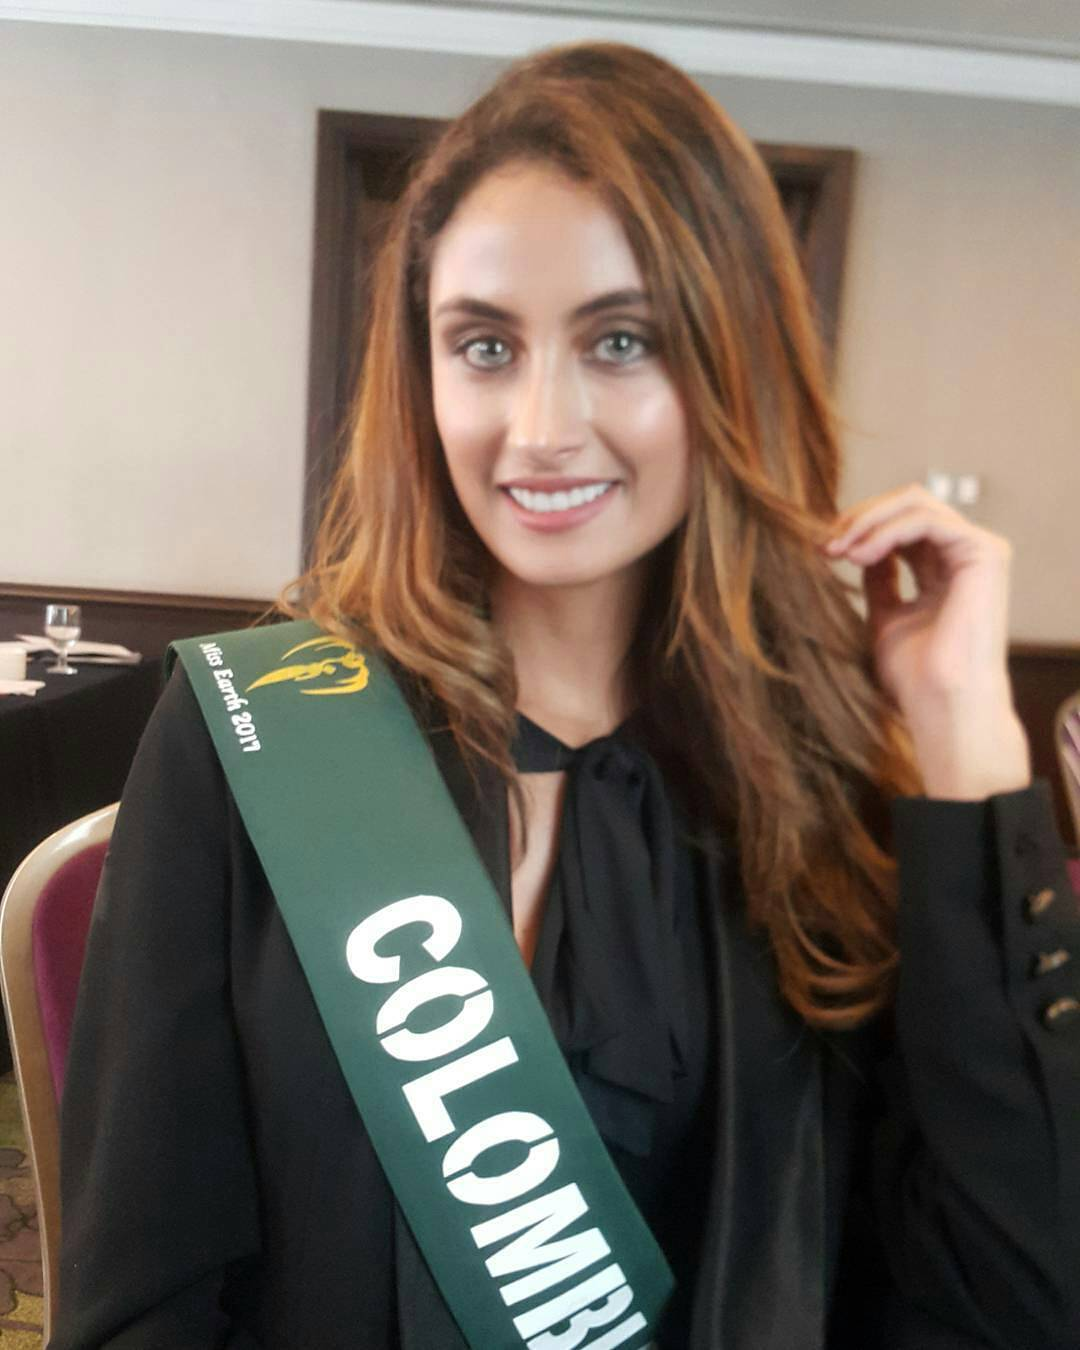 juliana franco, top 16 de miss colombia universo 2020/miss earth water 2017. - Página 4 22221410